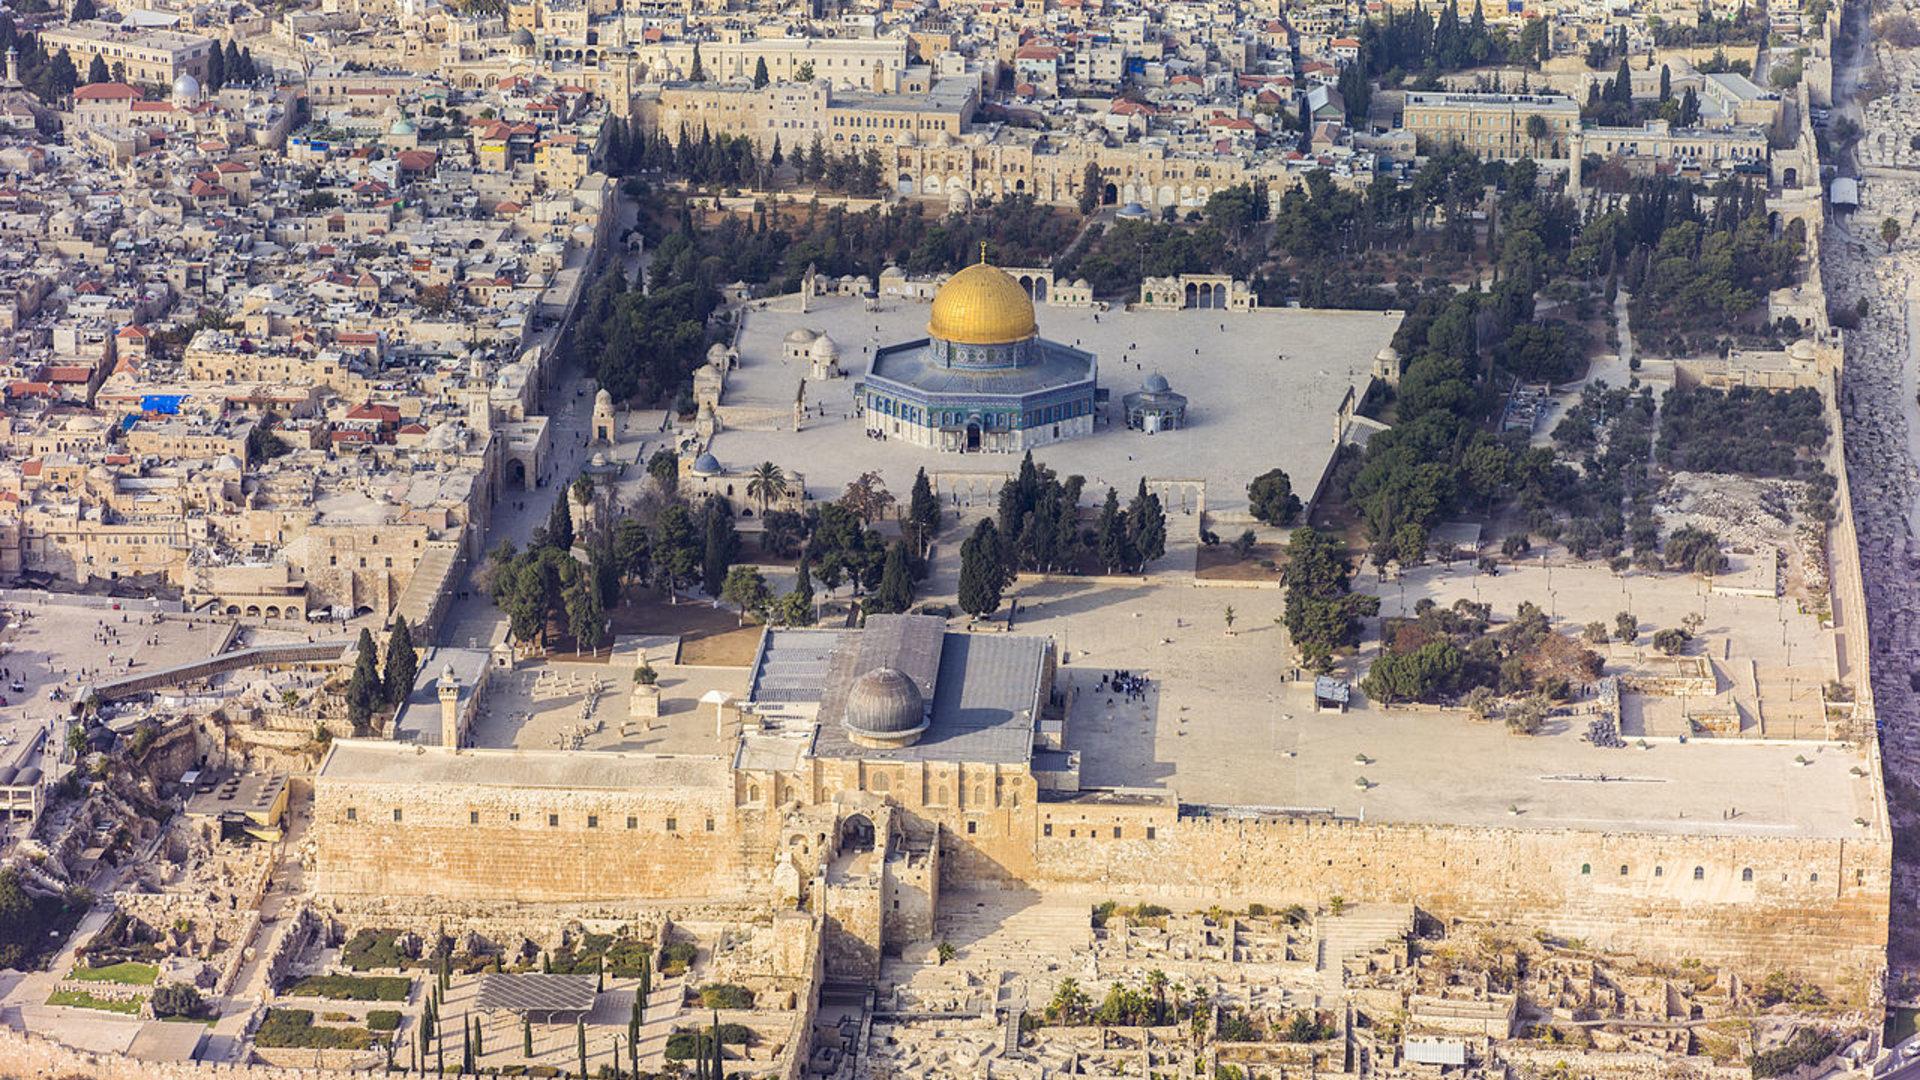 Israel 2013%282%29 aerial jerusalem temple mount temple mount %28south exposure%29